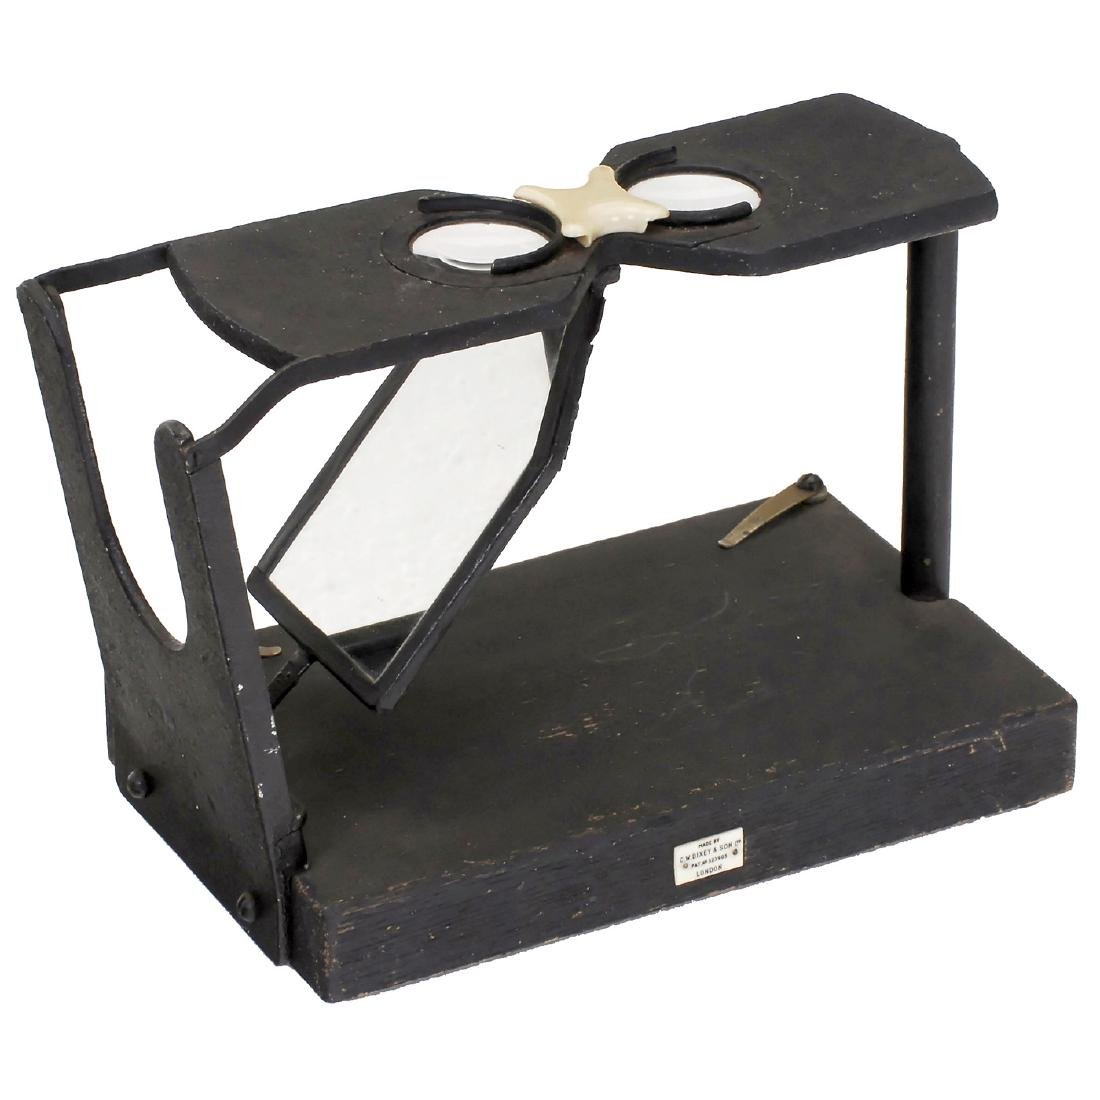 Maddox Stereoscope, c. 1920